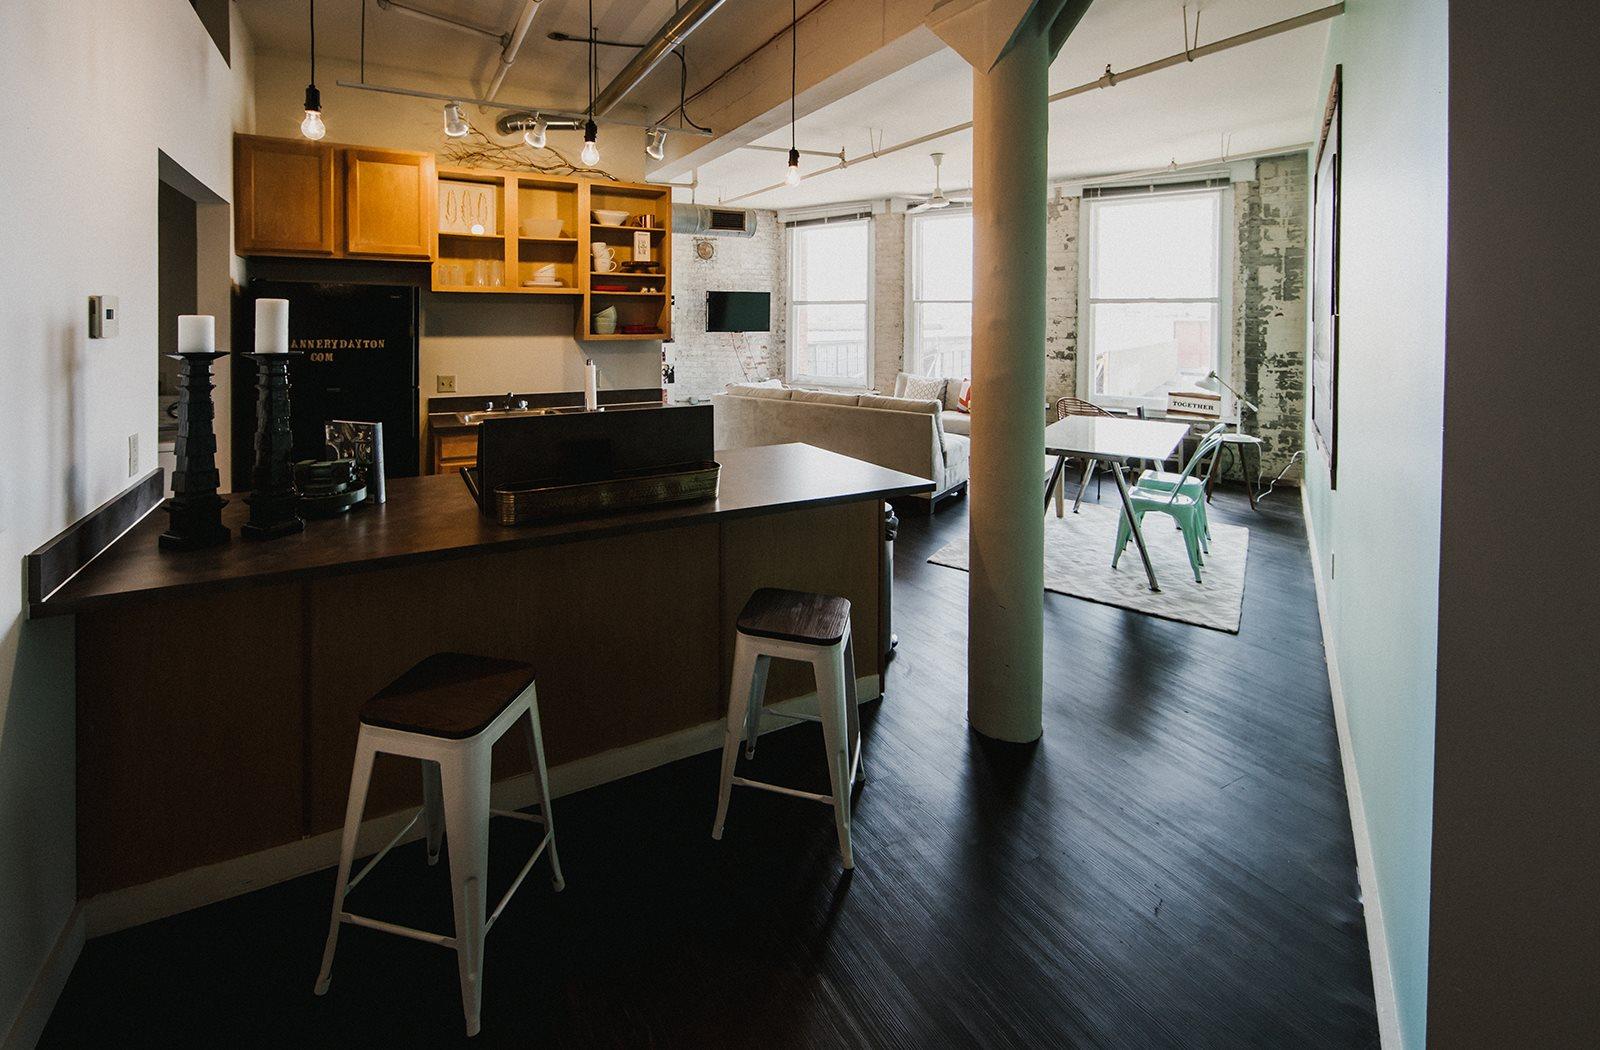 Dayton Apartments For Sale